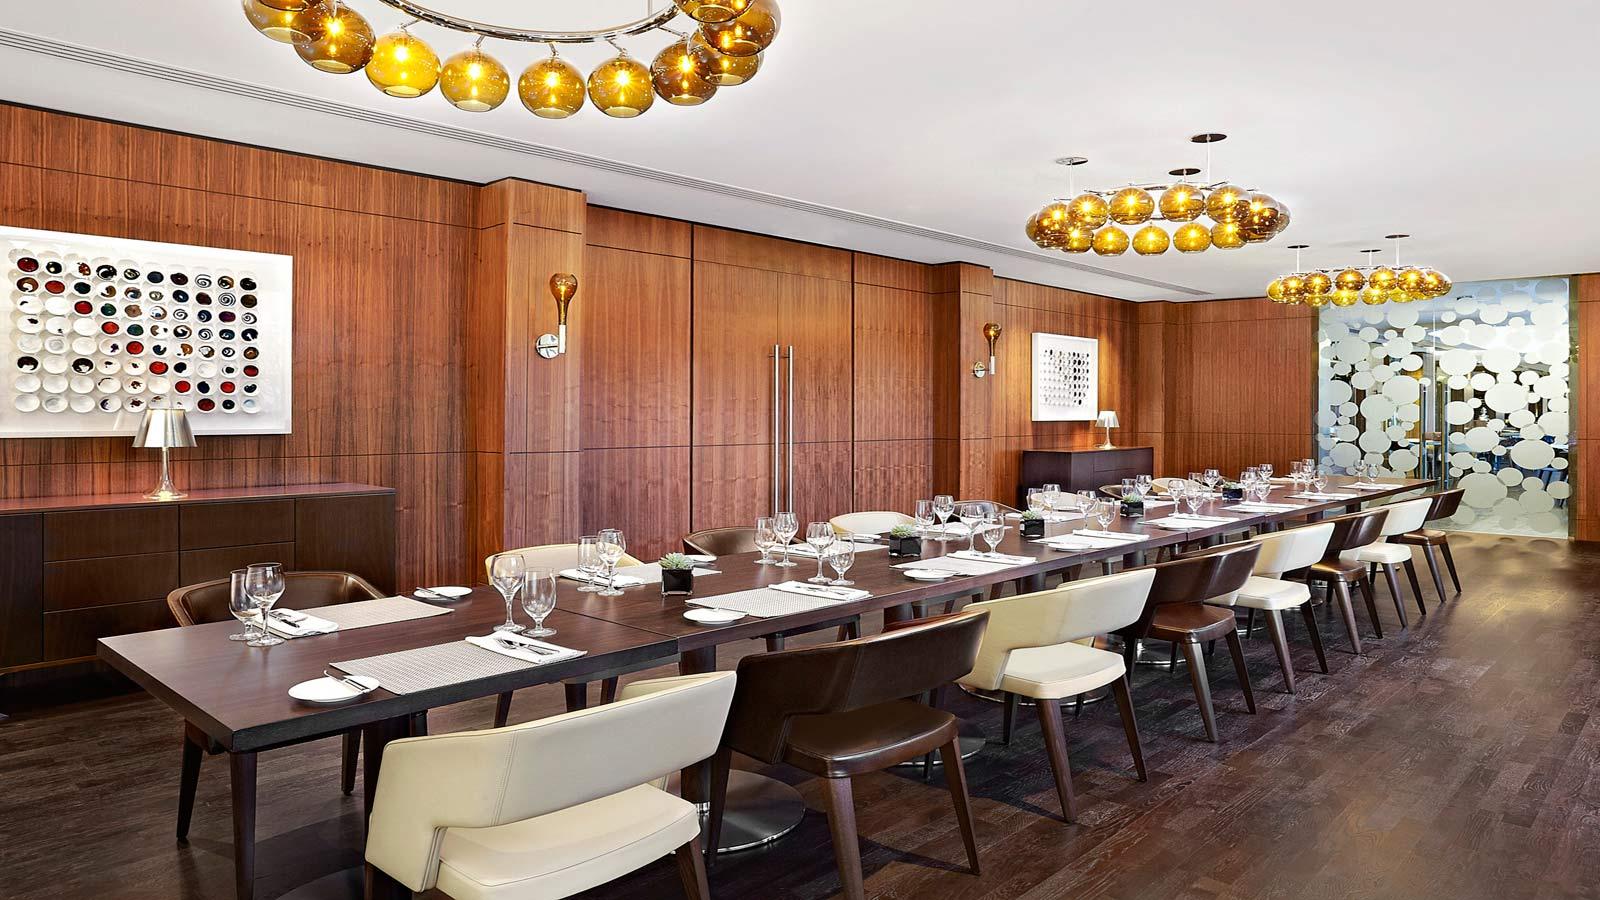 Meeting Rooms Edinburgh | Sheraton Edinburgh Hotel | Private Dining